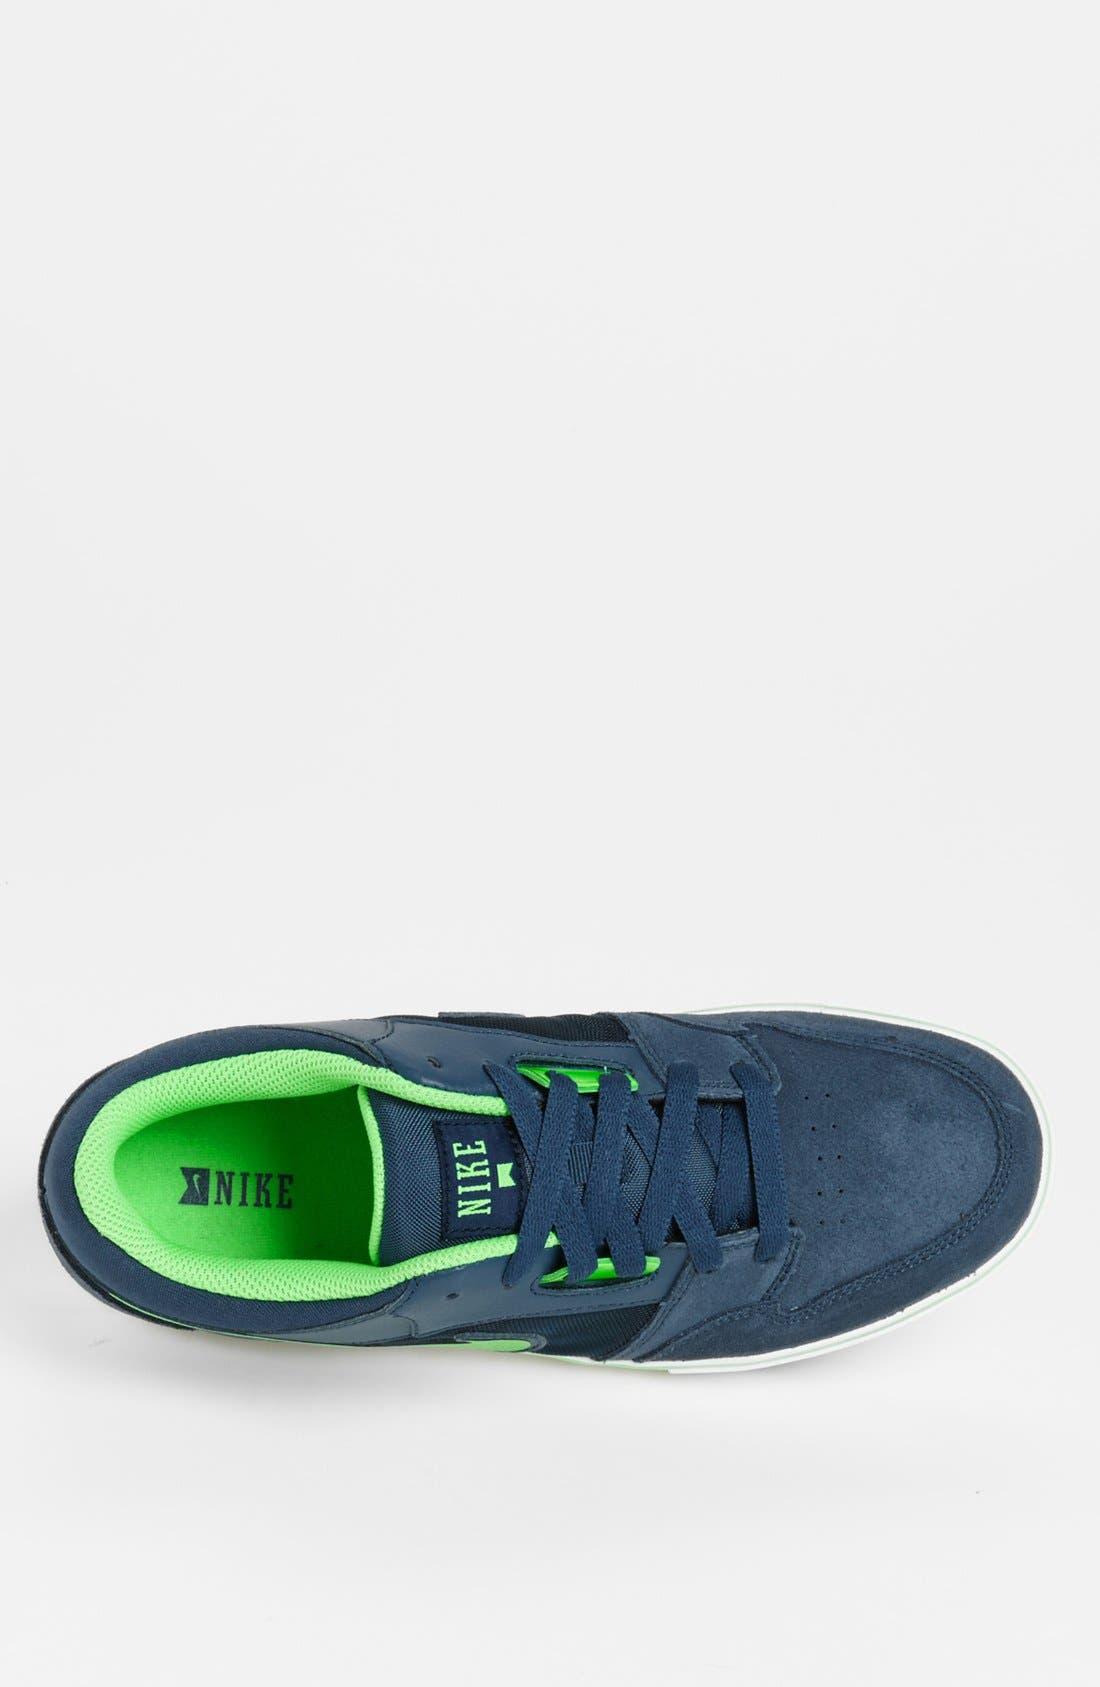 Alternate Image 3  - Nike 'Ruckus 2 LR' Skate Shoe (Men)